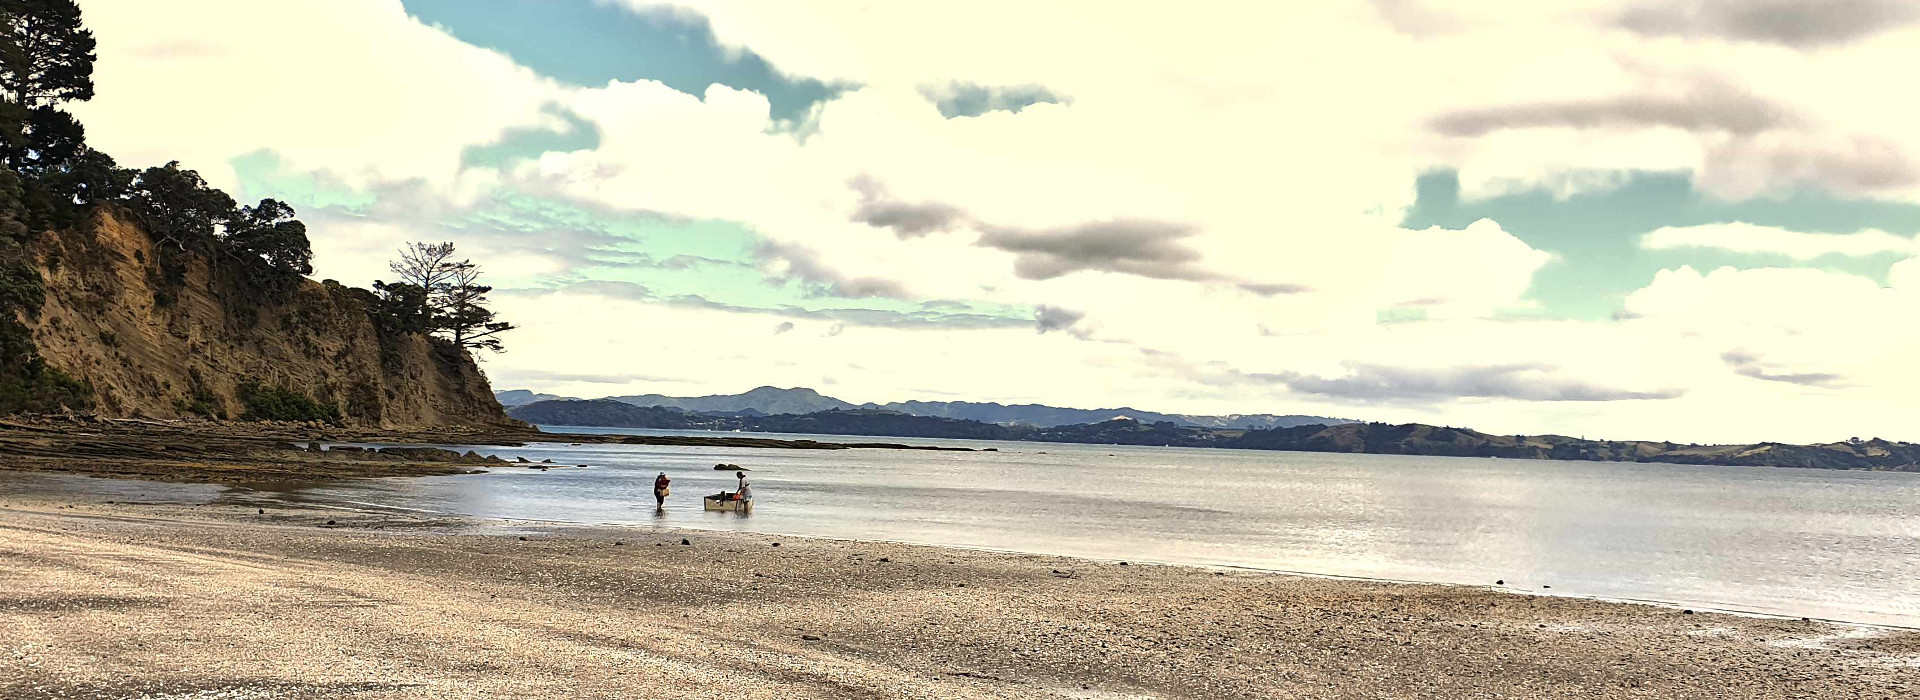 Scandrett Regional Park pocket perfect beach at low tide Auckland, New Zealand